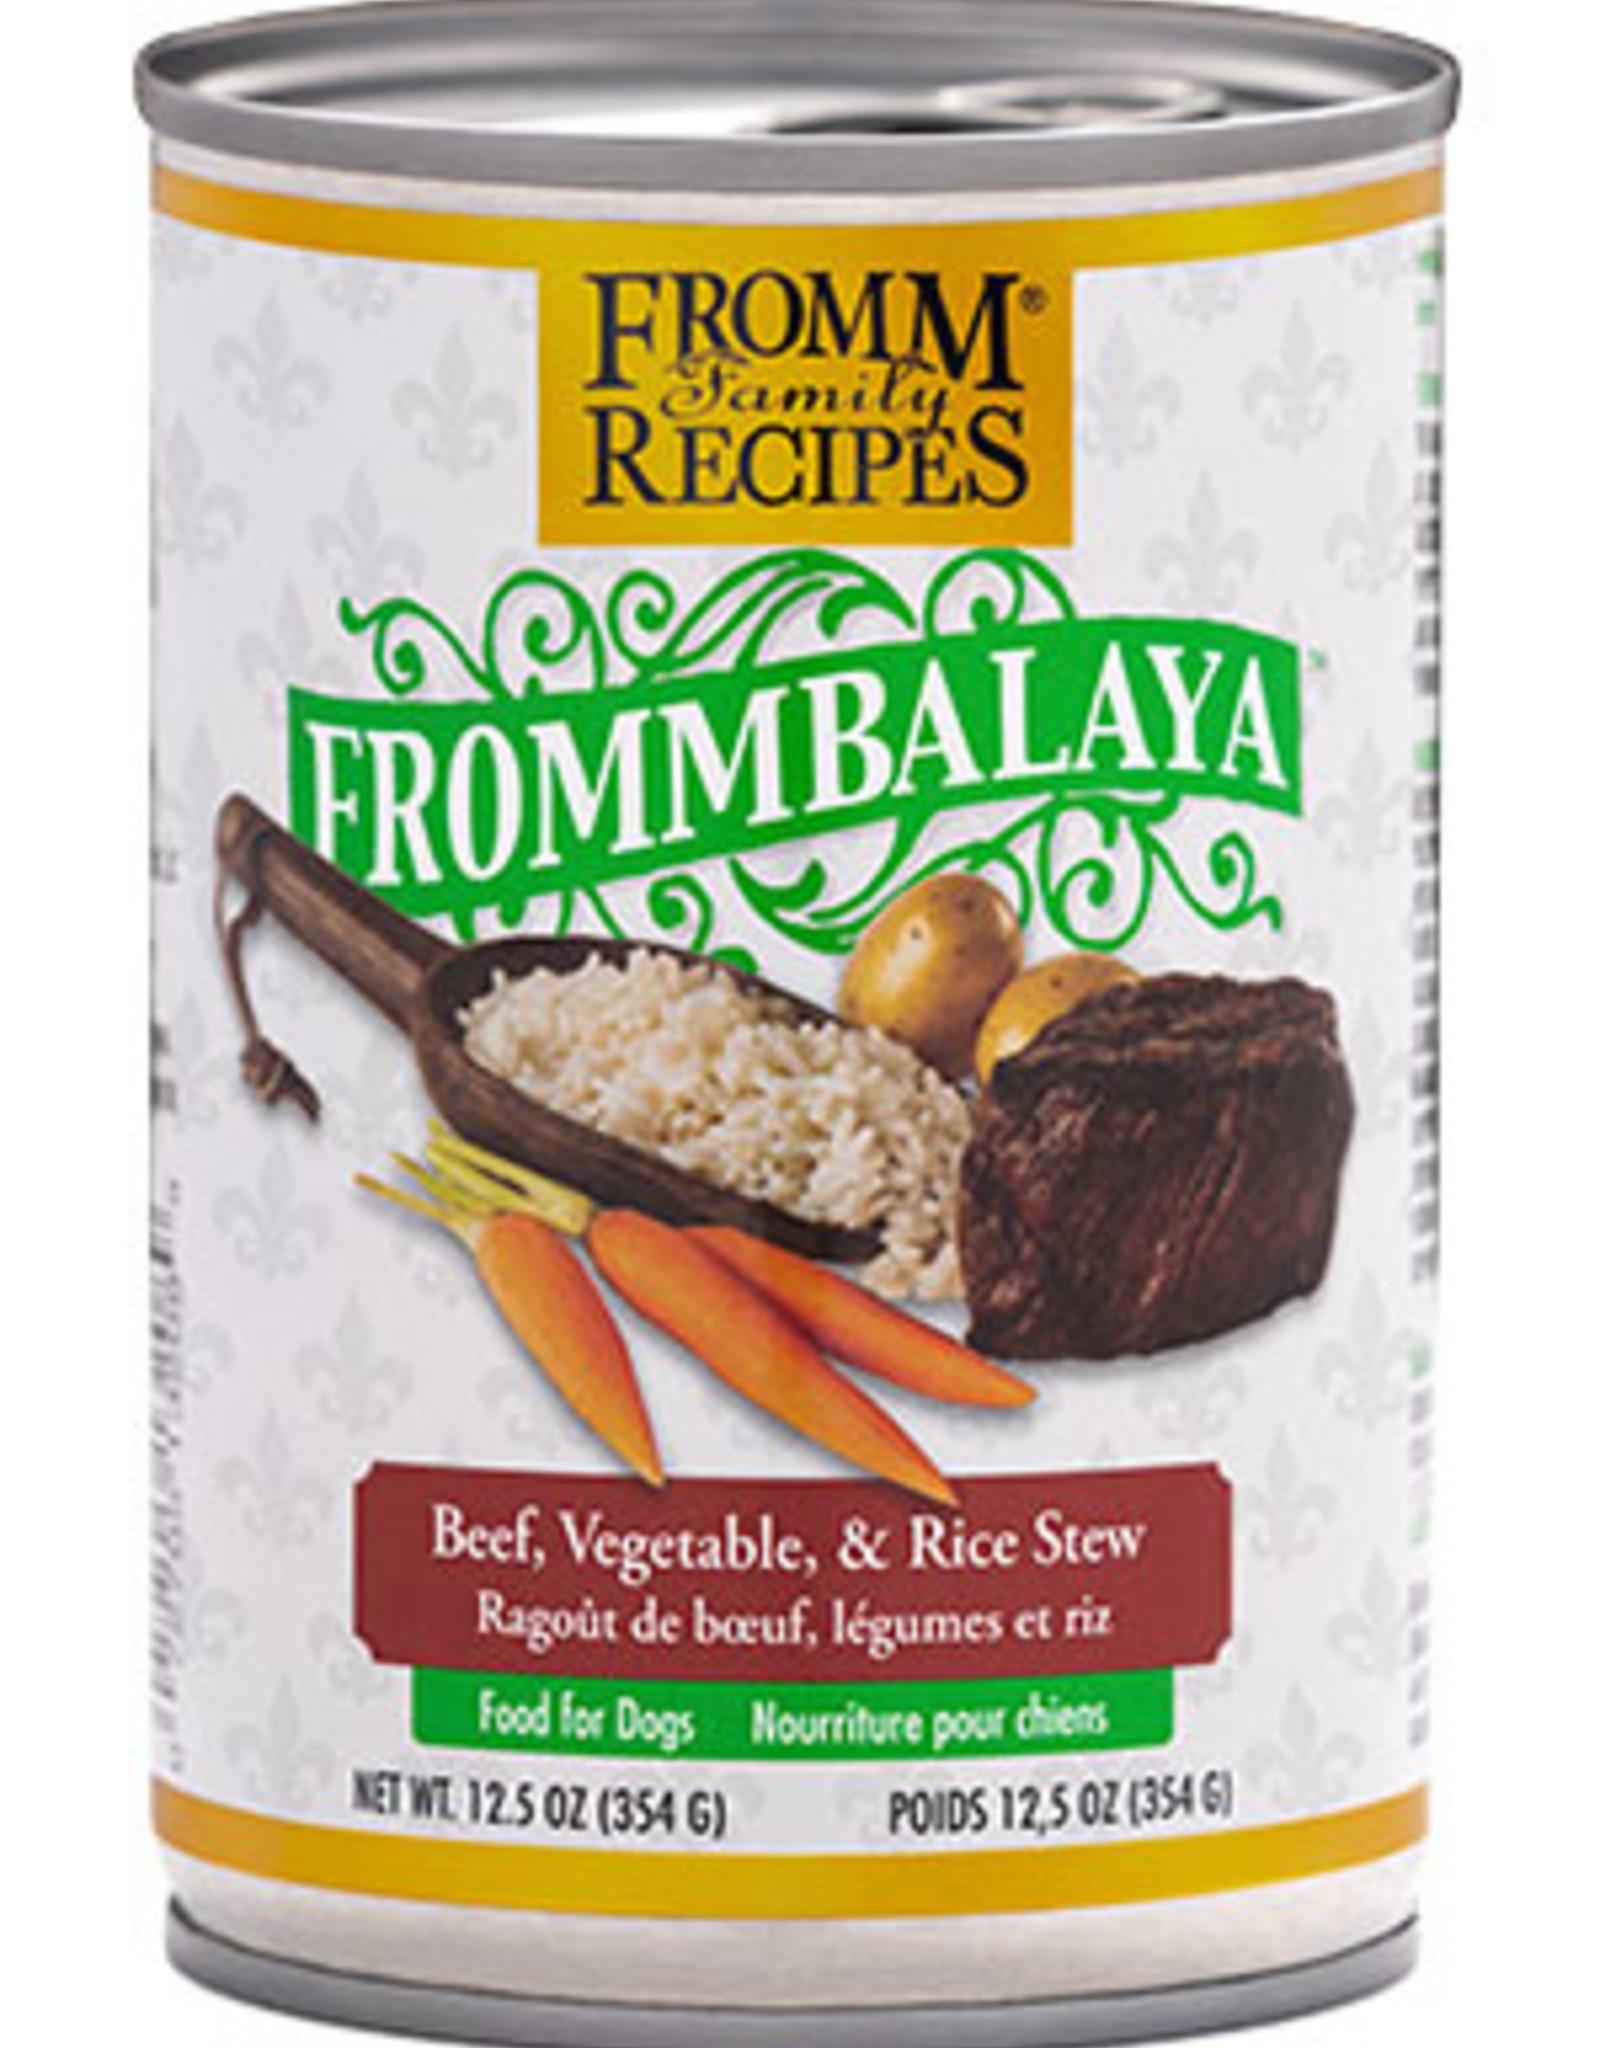 Fromm Beef, Vegetable, & Rice Stew 12.5oz